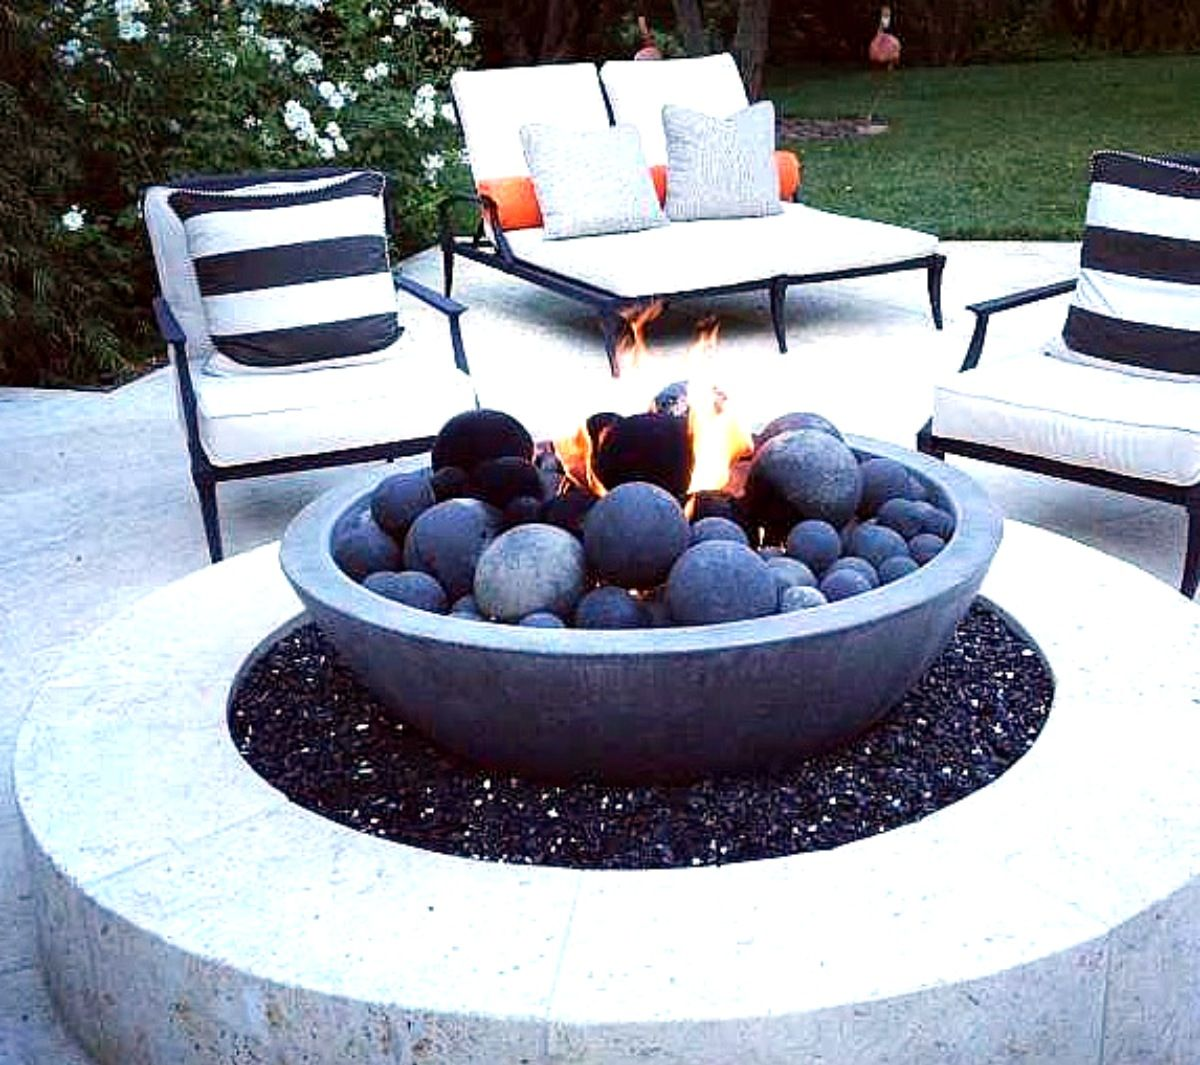 Backyard patio firepit ideas - Ok Thisssss Firepit Stylish This Is Supposedly Khloe S Kardashian S Firepit Ideaspatio Ideasbackyard